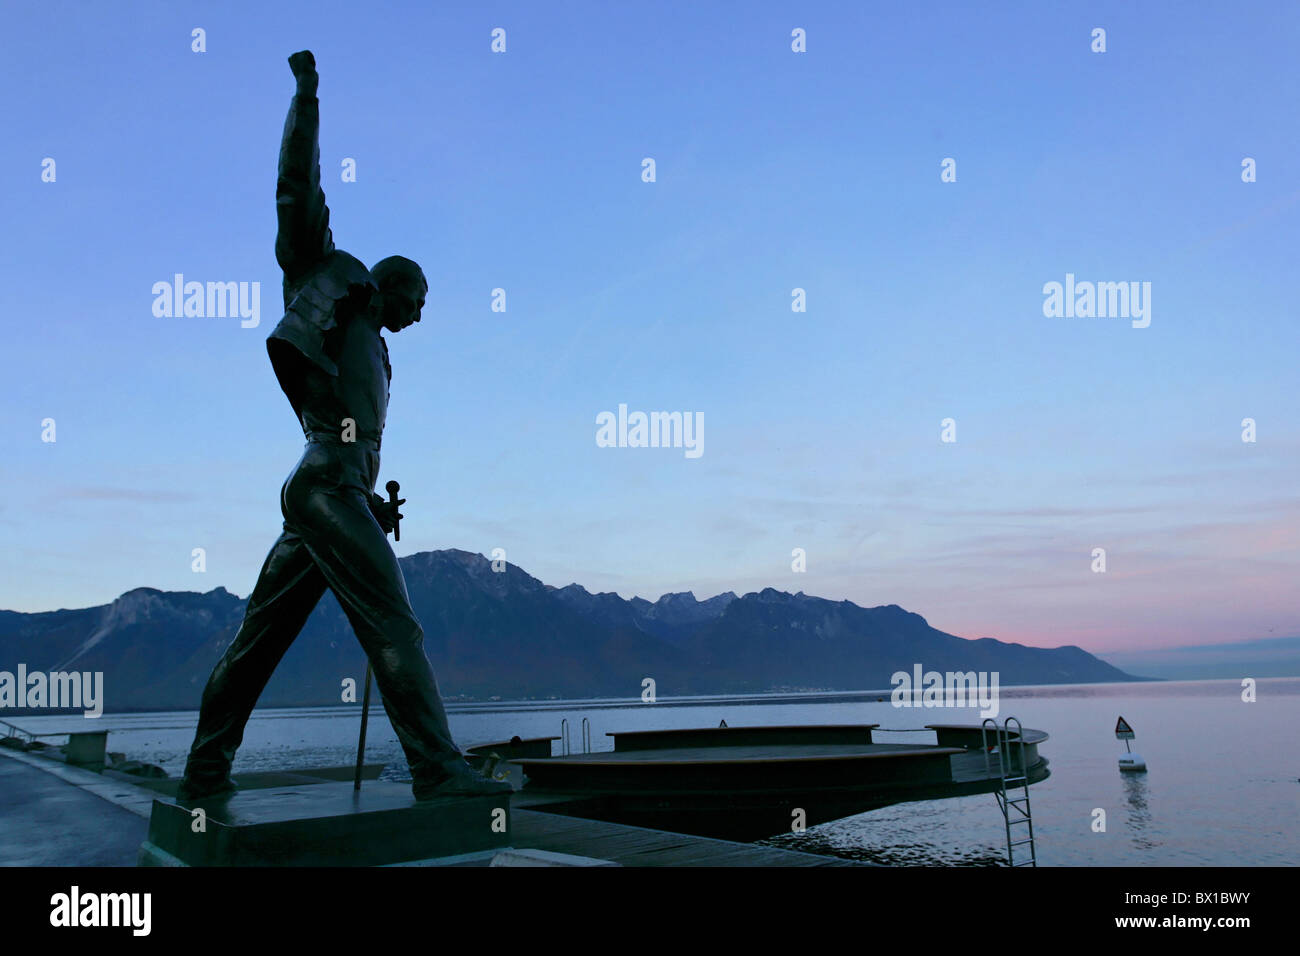 Freddie Mercury Statue Denkmal Königin Musik Sänger Musiker Rock Musik See Genf Lac Leman Stimmung See Stockfoto